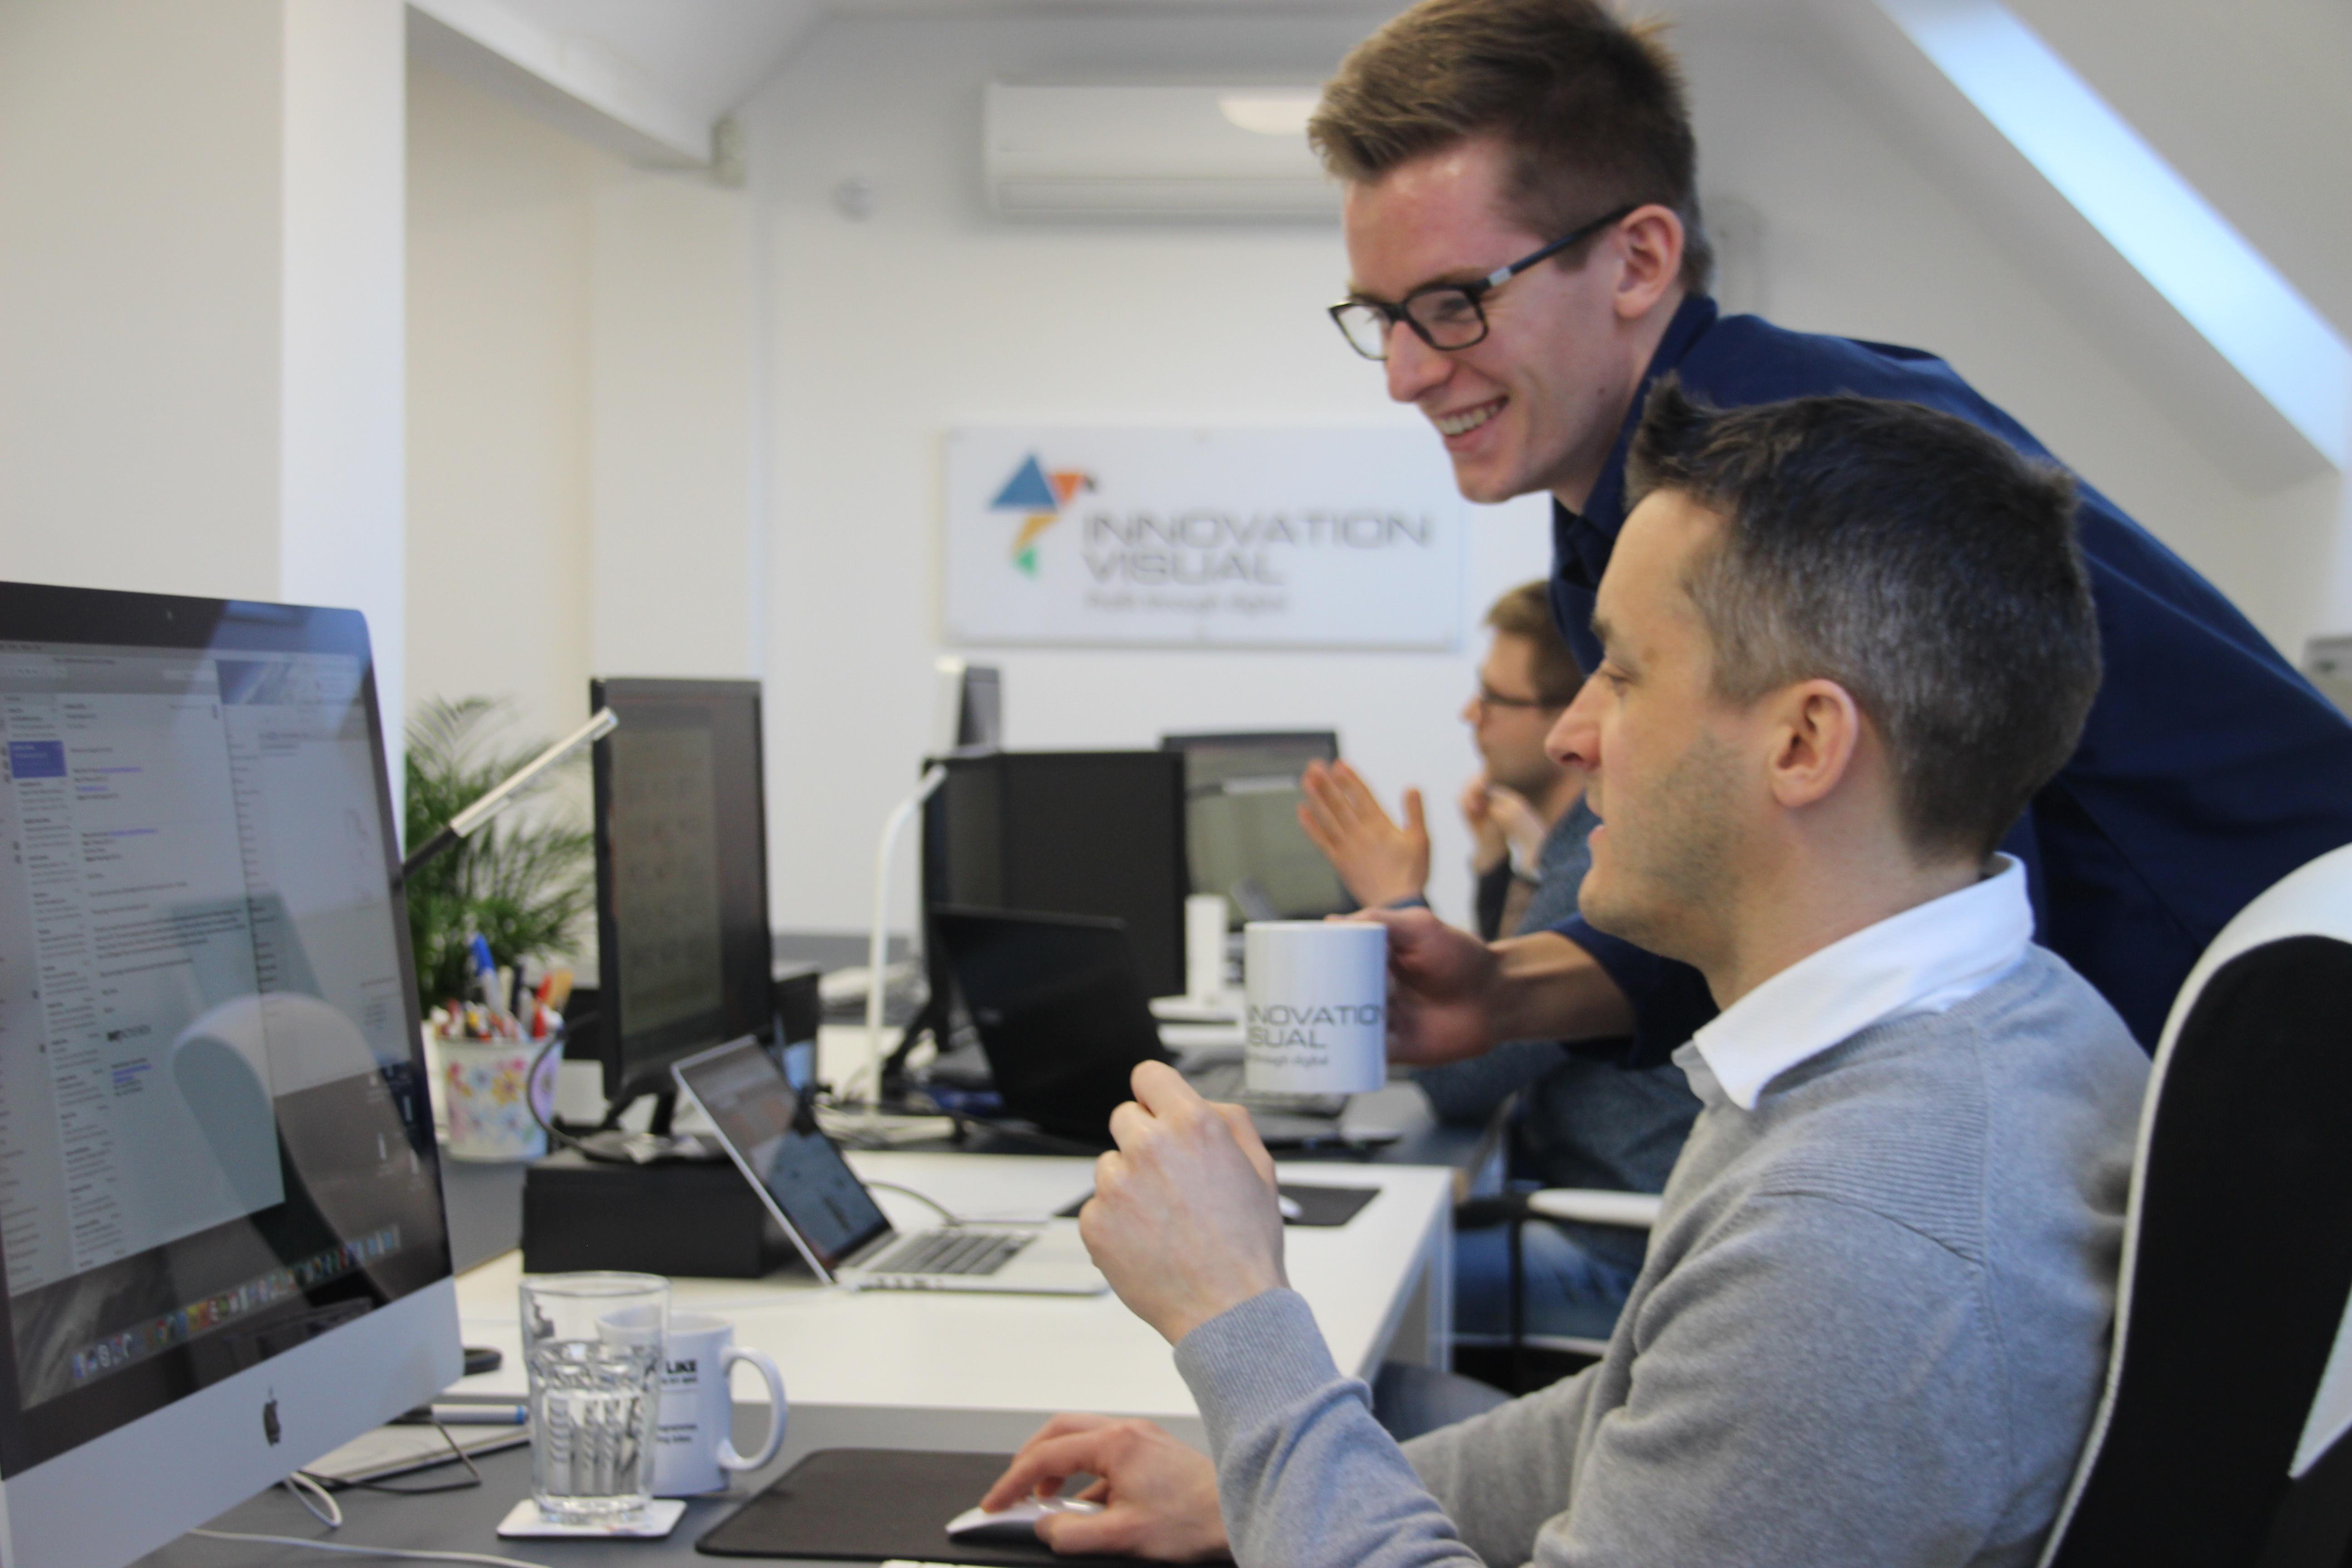 Innovation Visual team talking about digital marketing